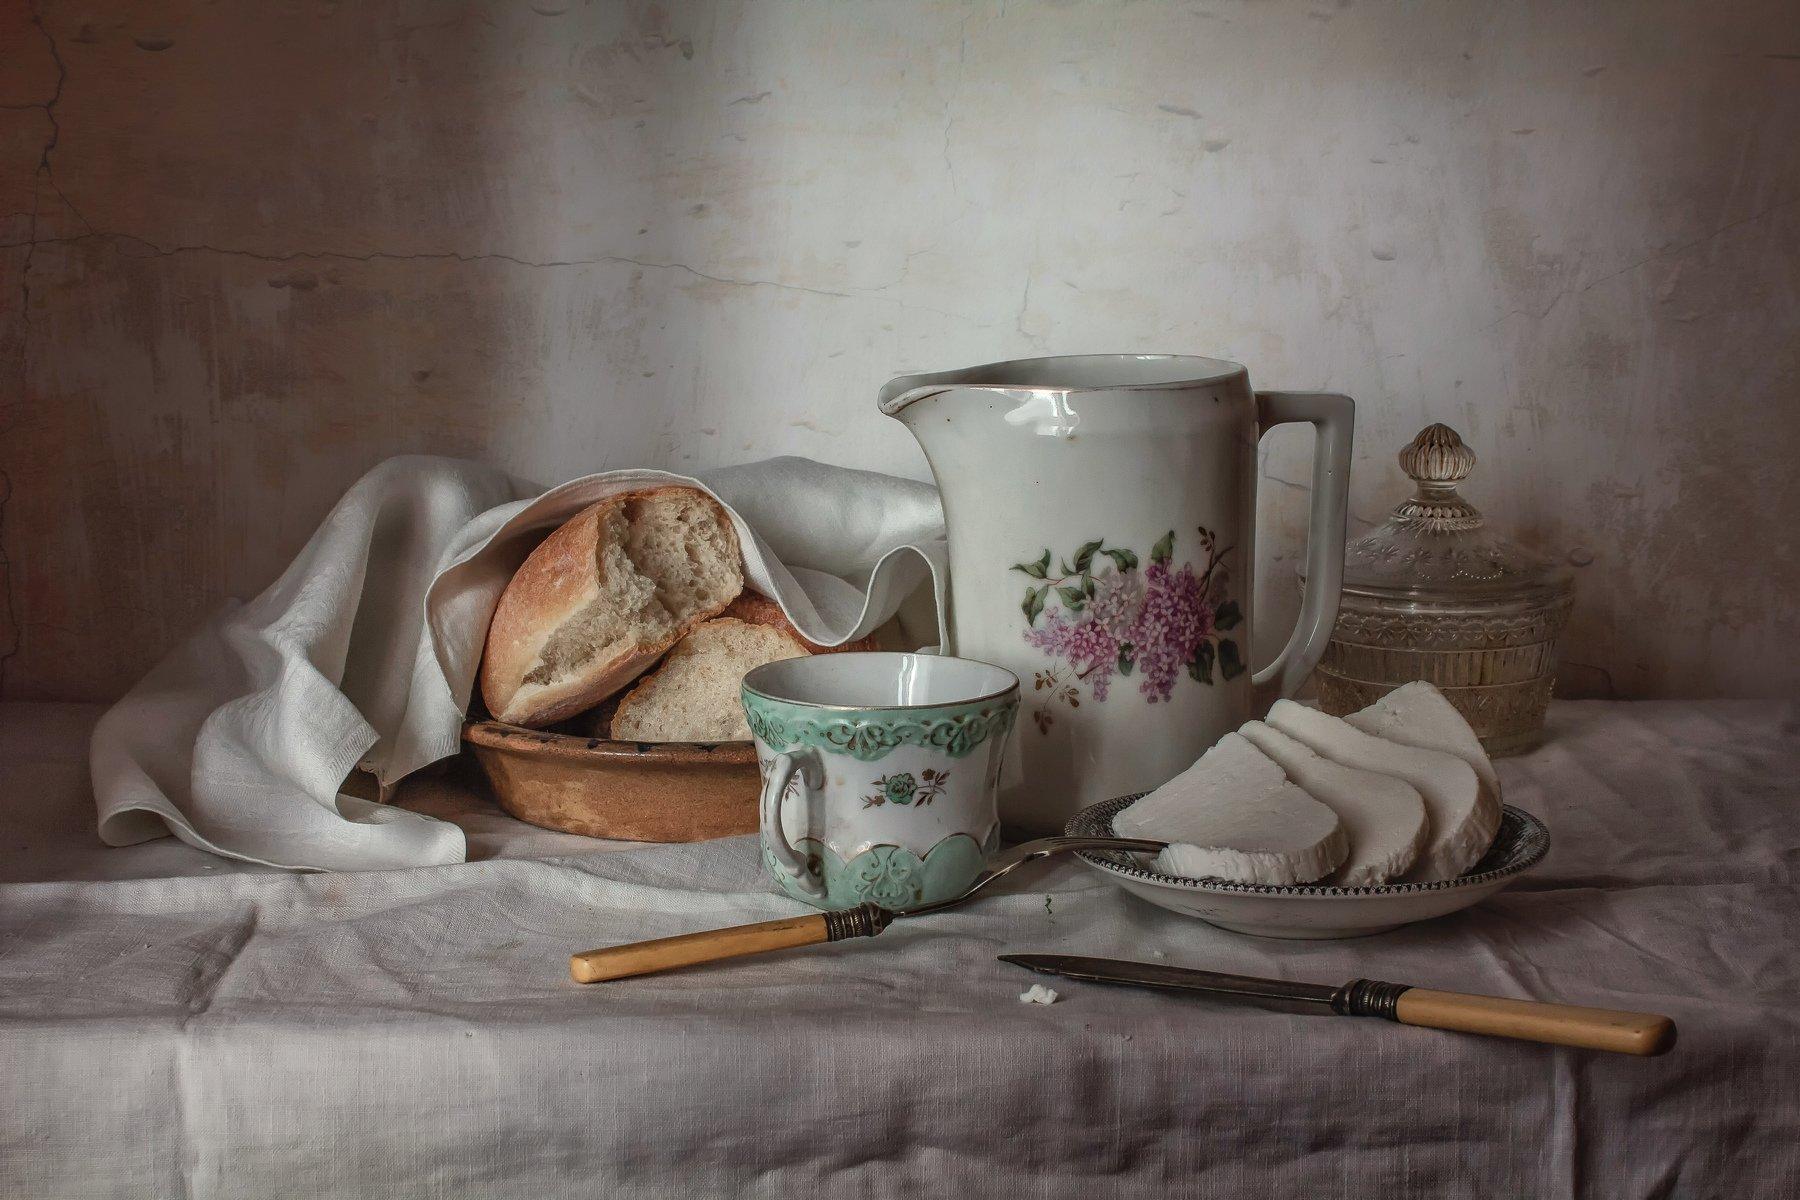 натюрморт, фарфор, кувшин, сыр, хлеб, Анна Петина